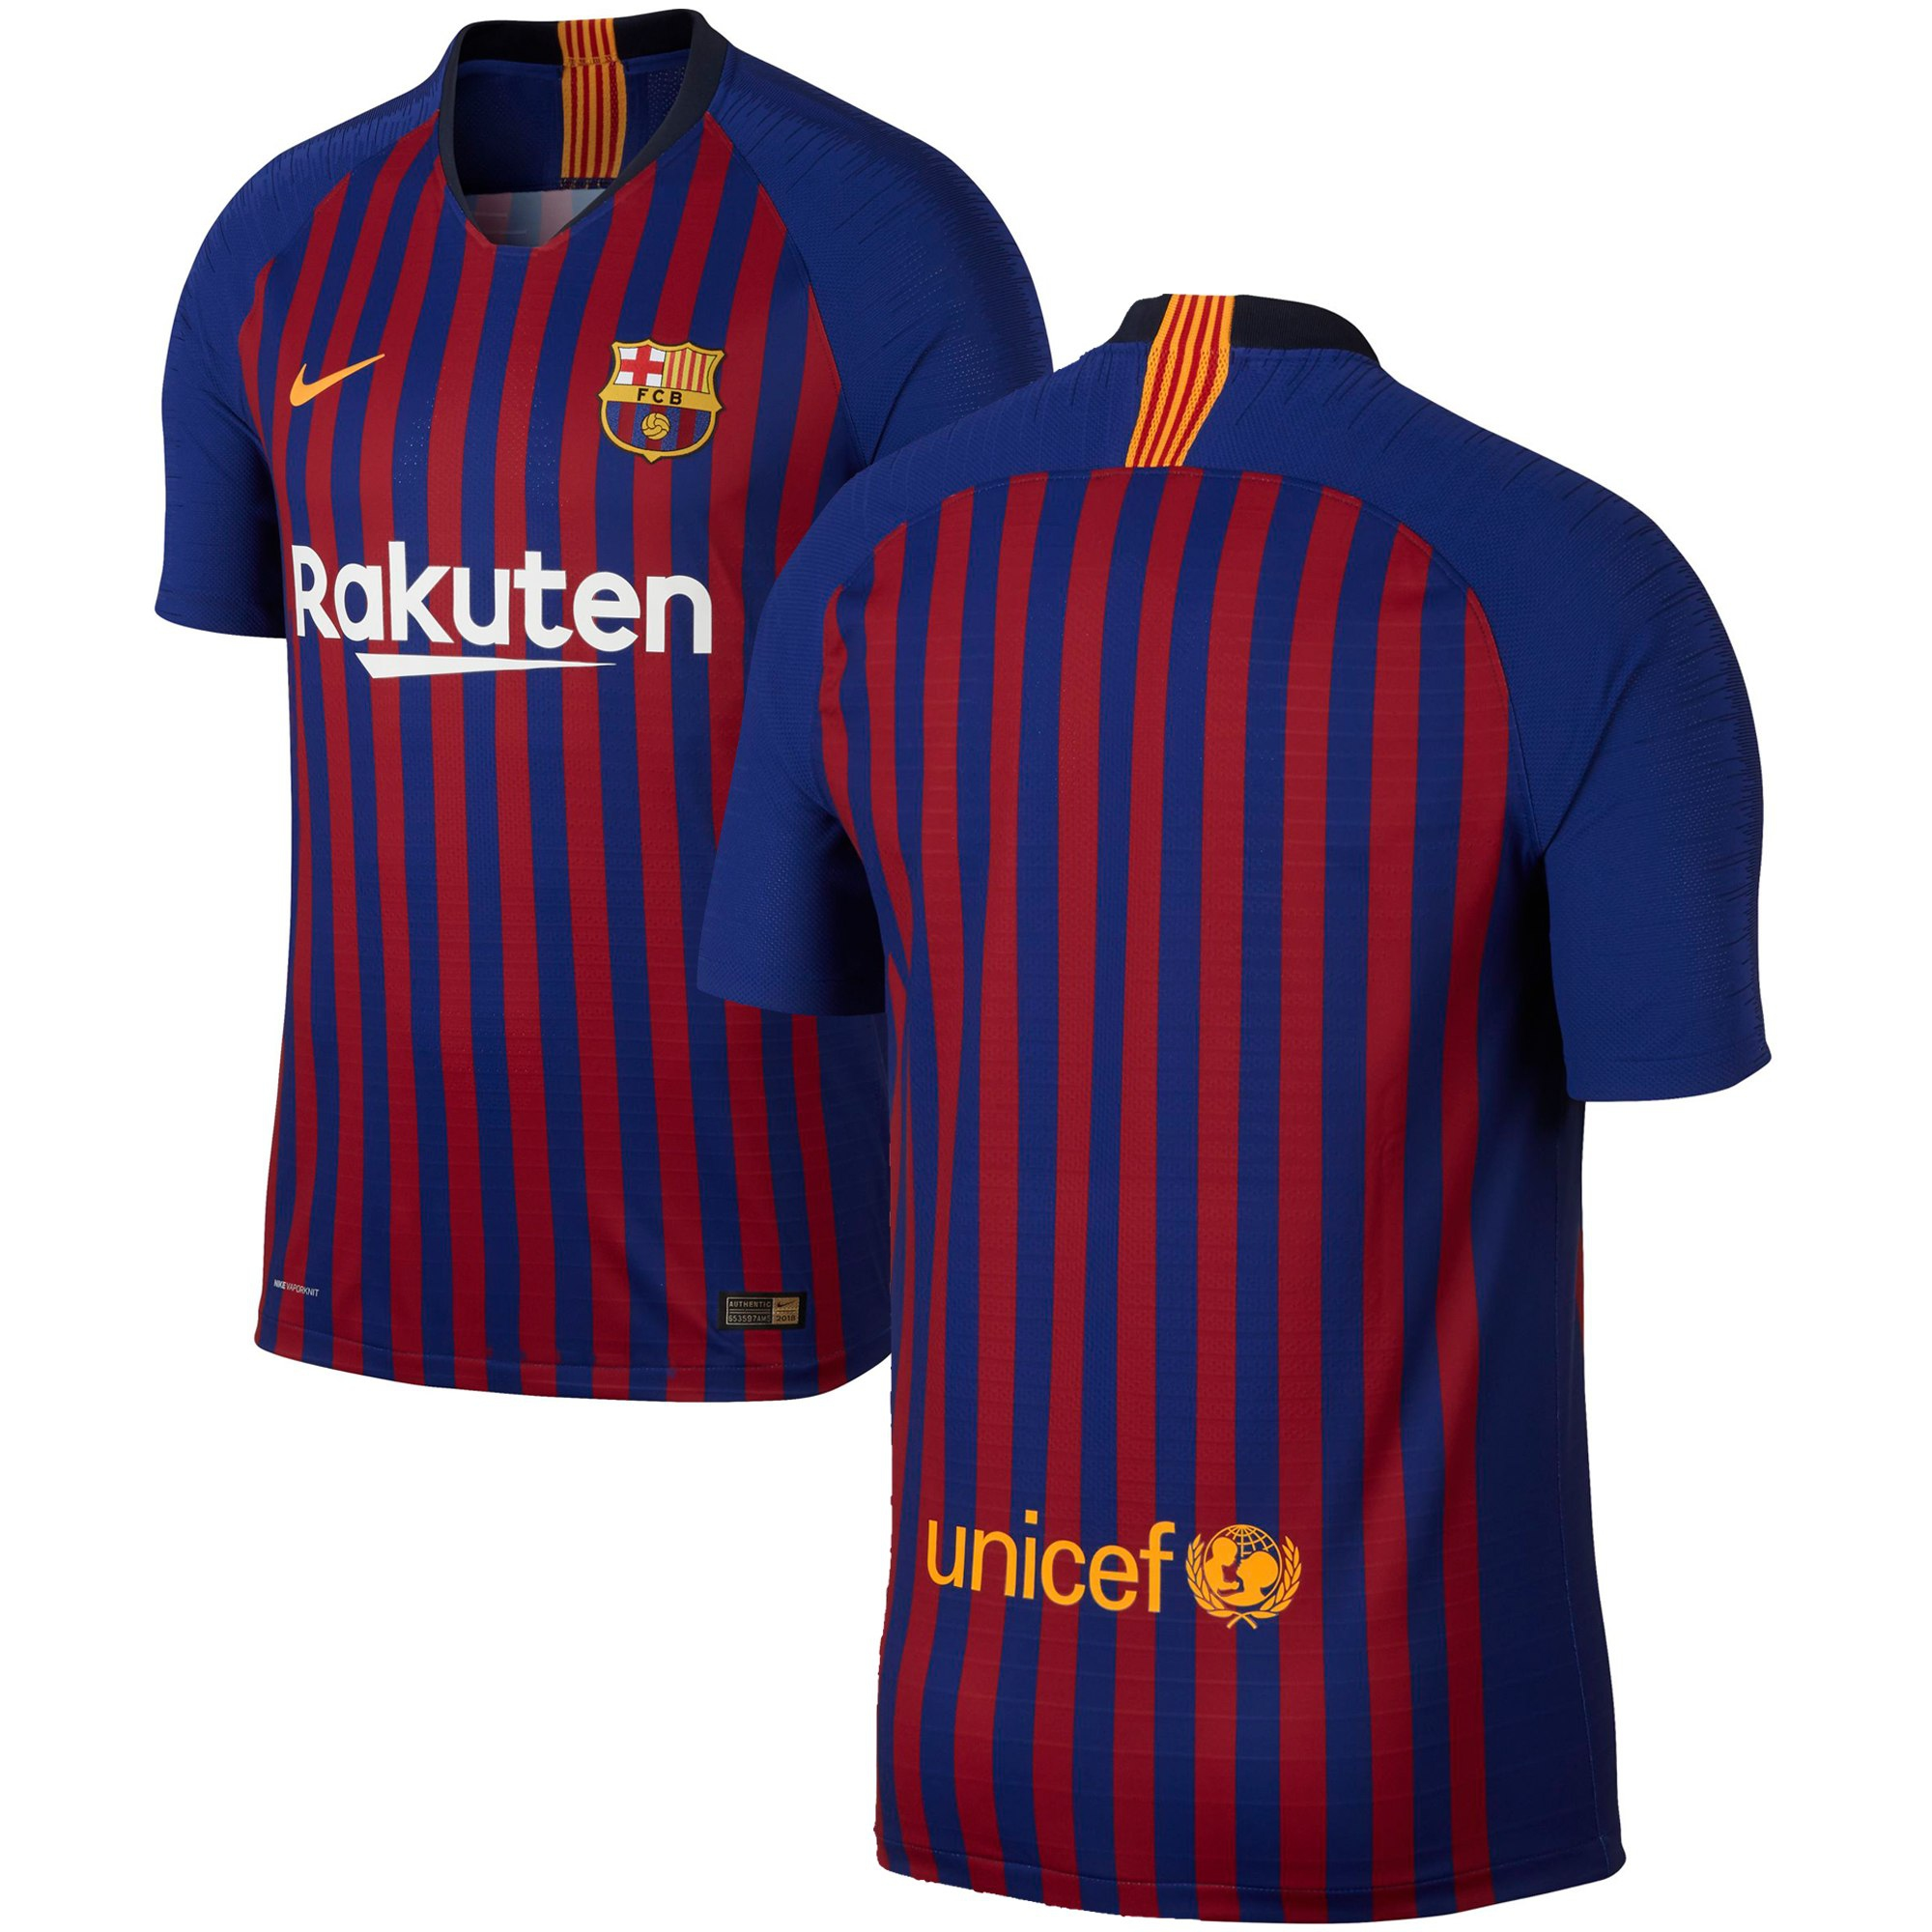 5d5af1d56 Jersey - FC Barcelona Home Jersey 2018 2019 Football Jersey Online Malaysia